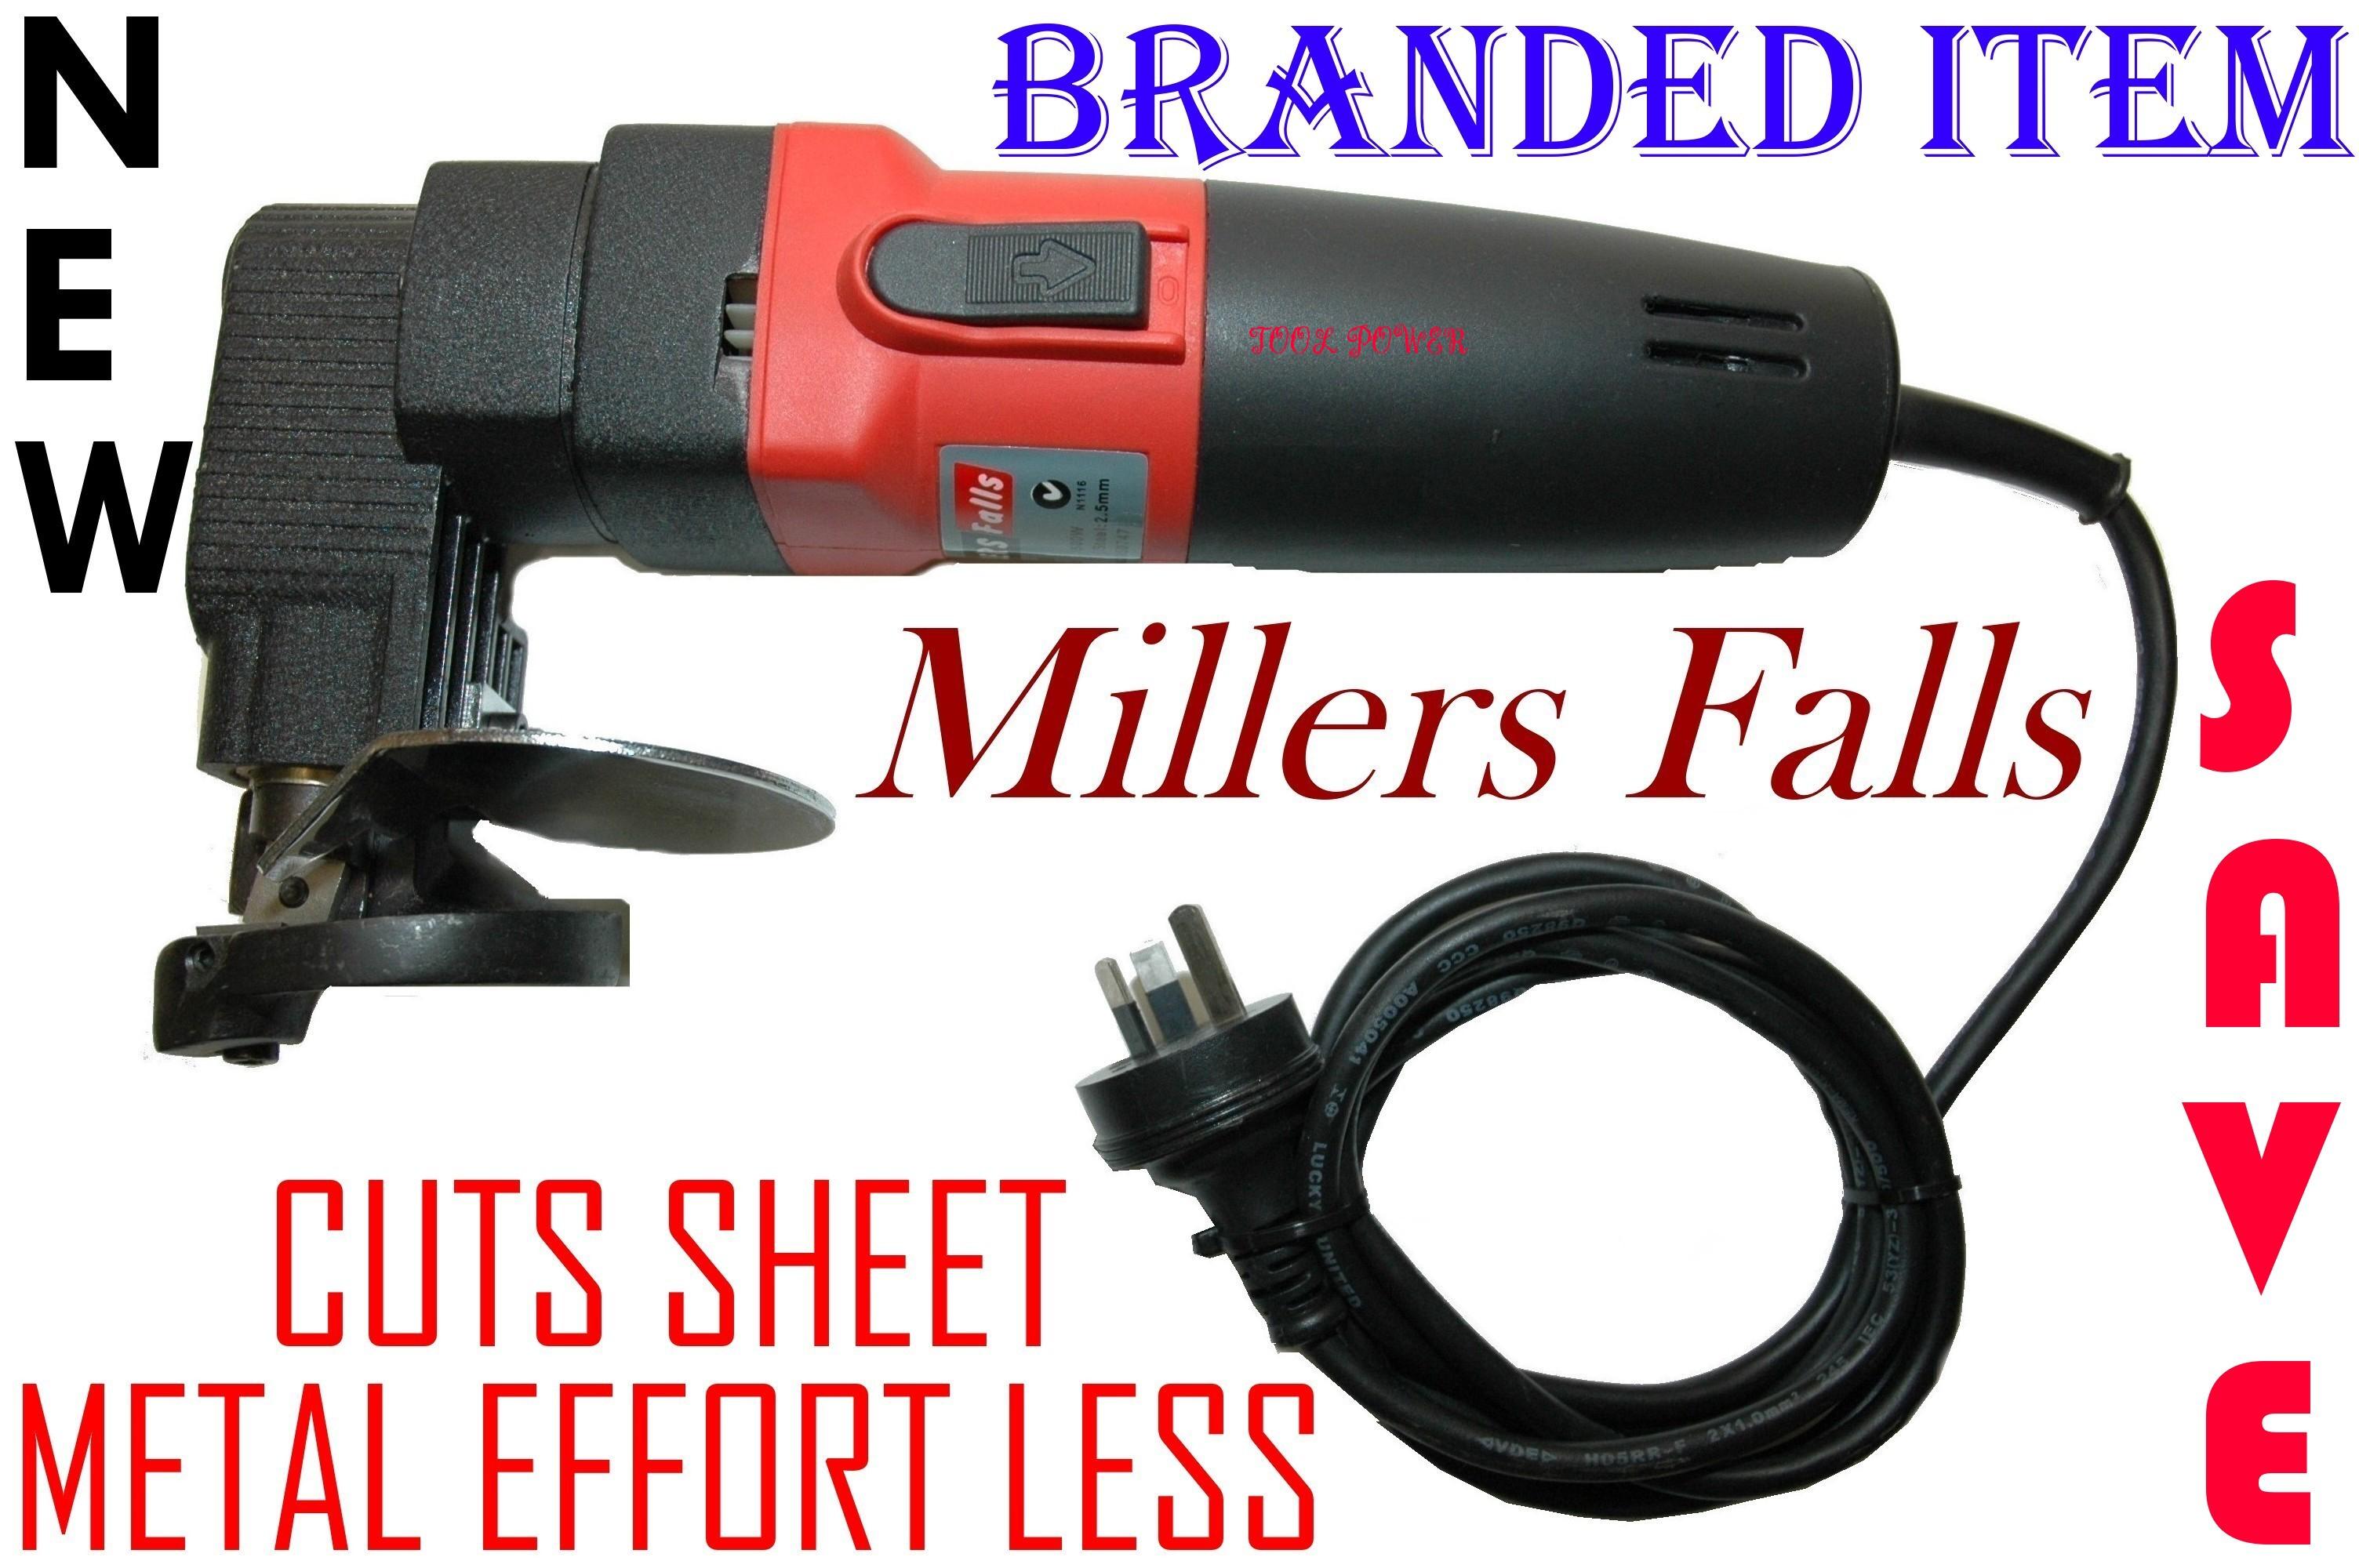 Metal Shear Millers Falls = CUTS SHEET METAL EFFORT LESS = Proven Model*********-0